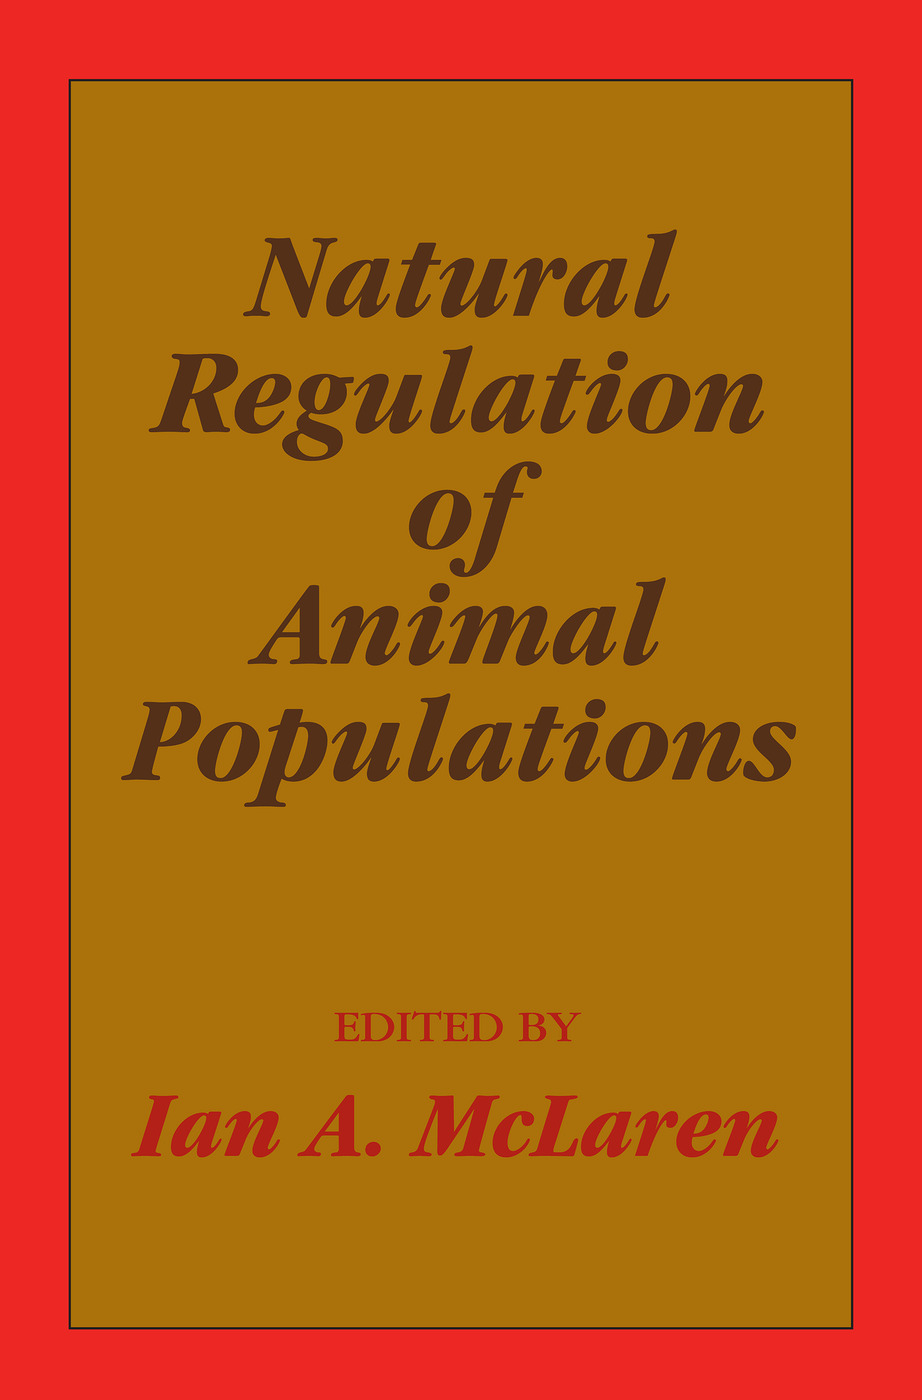 The Natural Selection of Self-Regulatory Behavior in Animal Populations